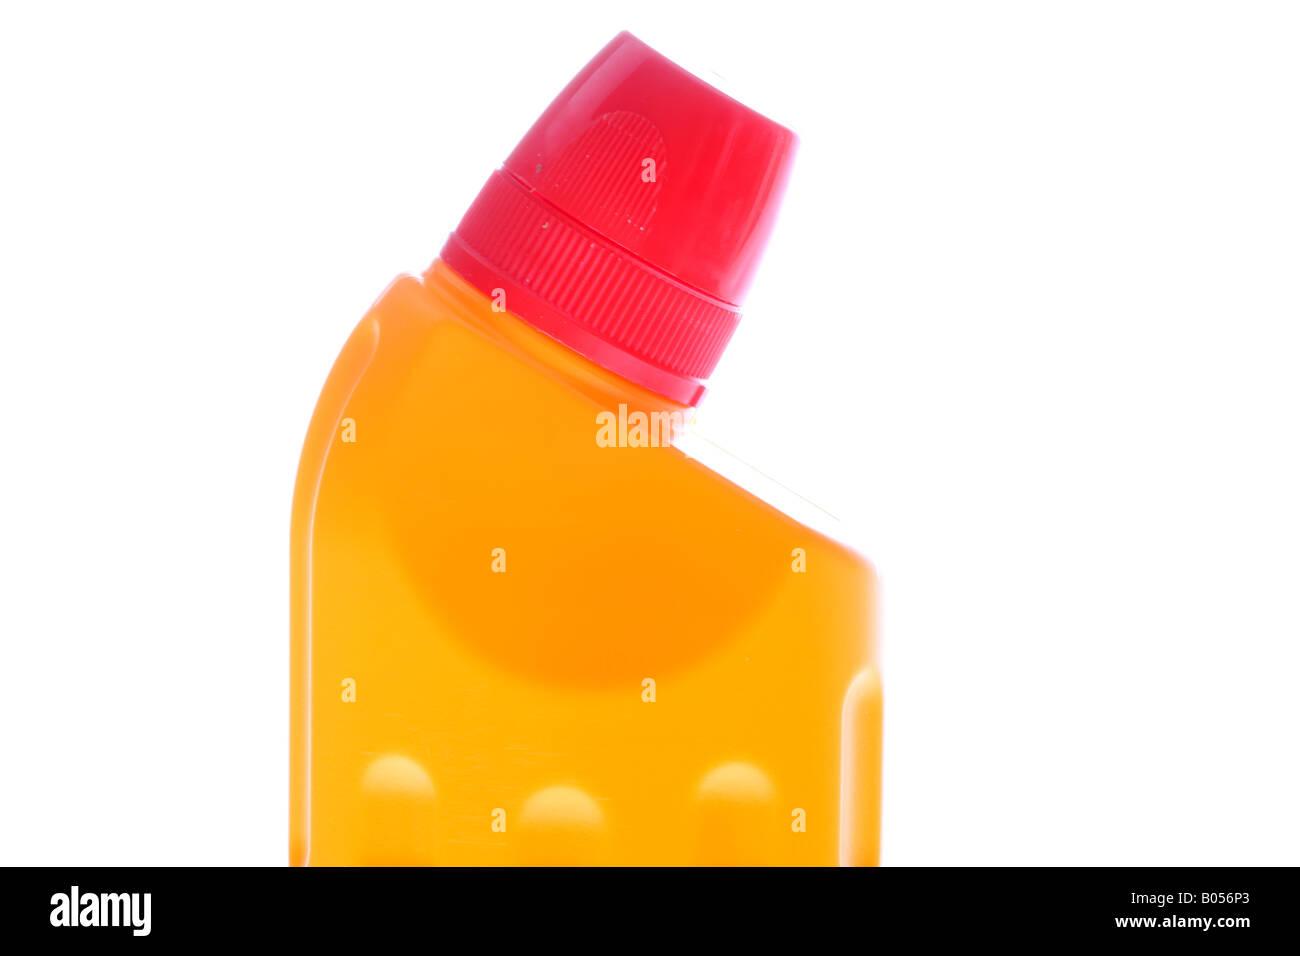 Botella de lejía Foto de stock